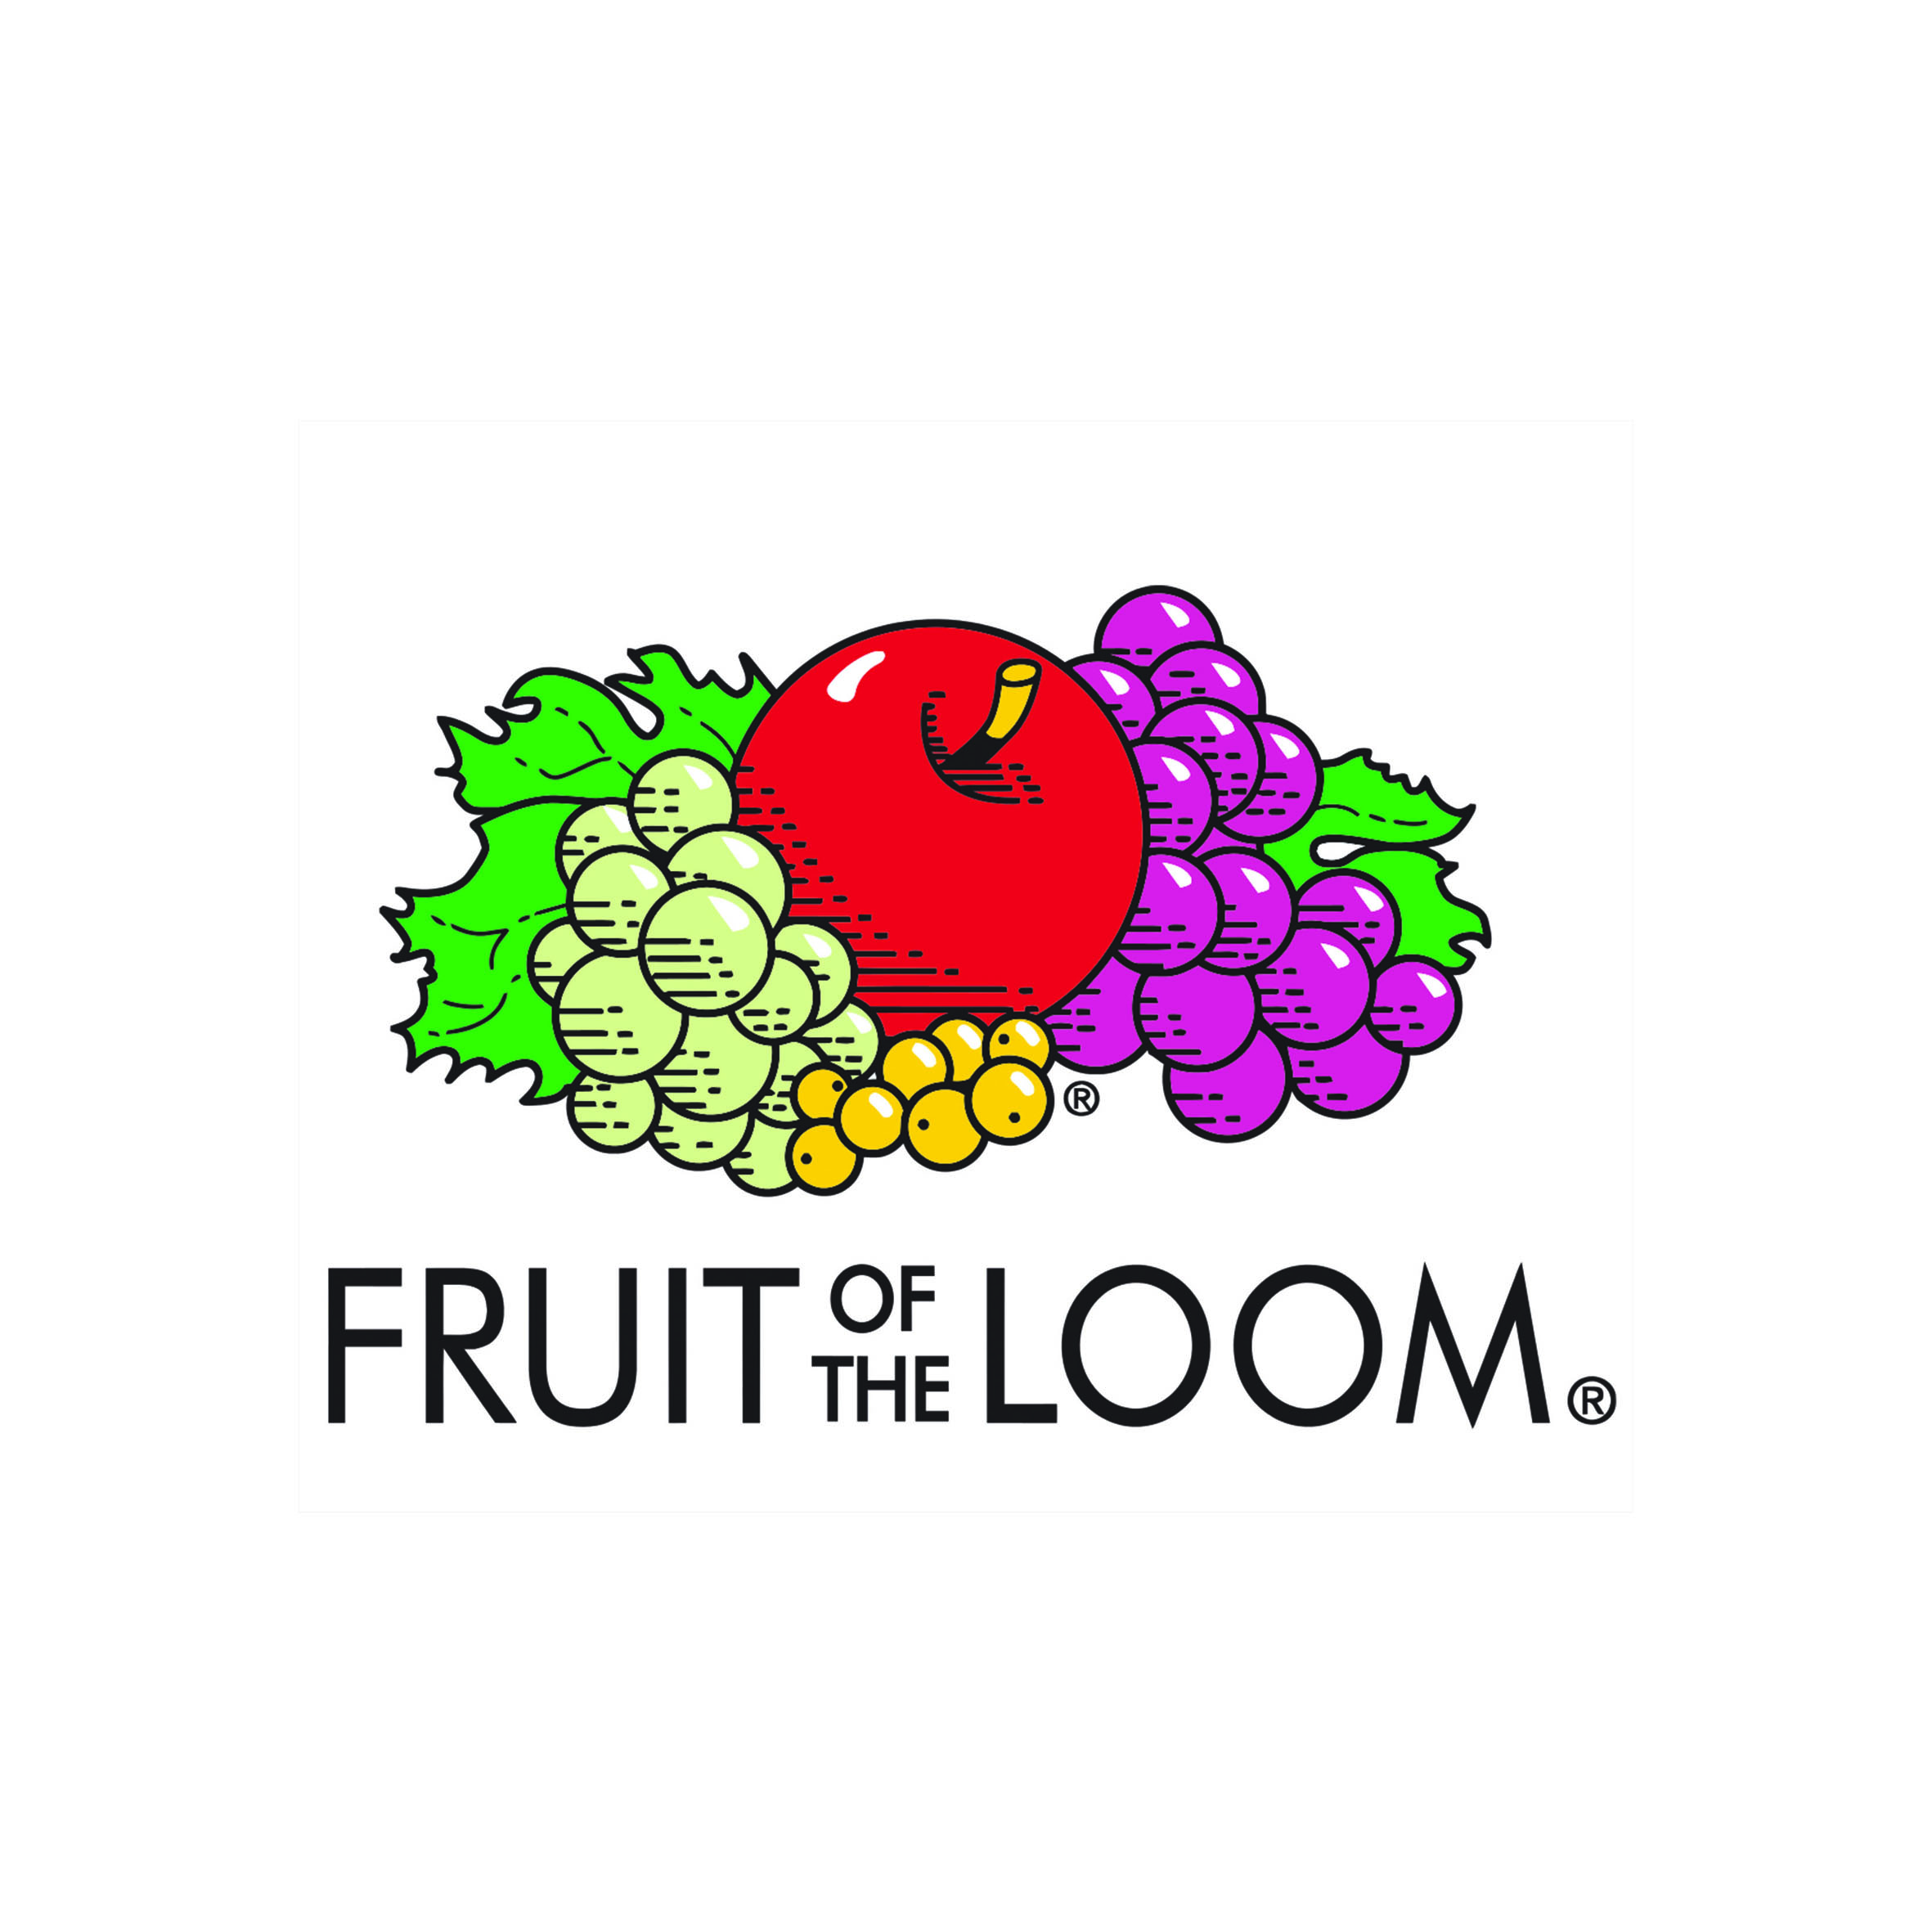 Fruitofthe